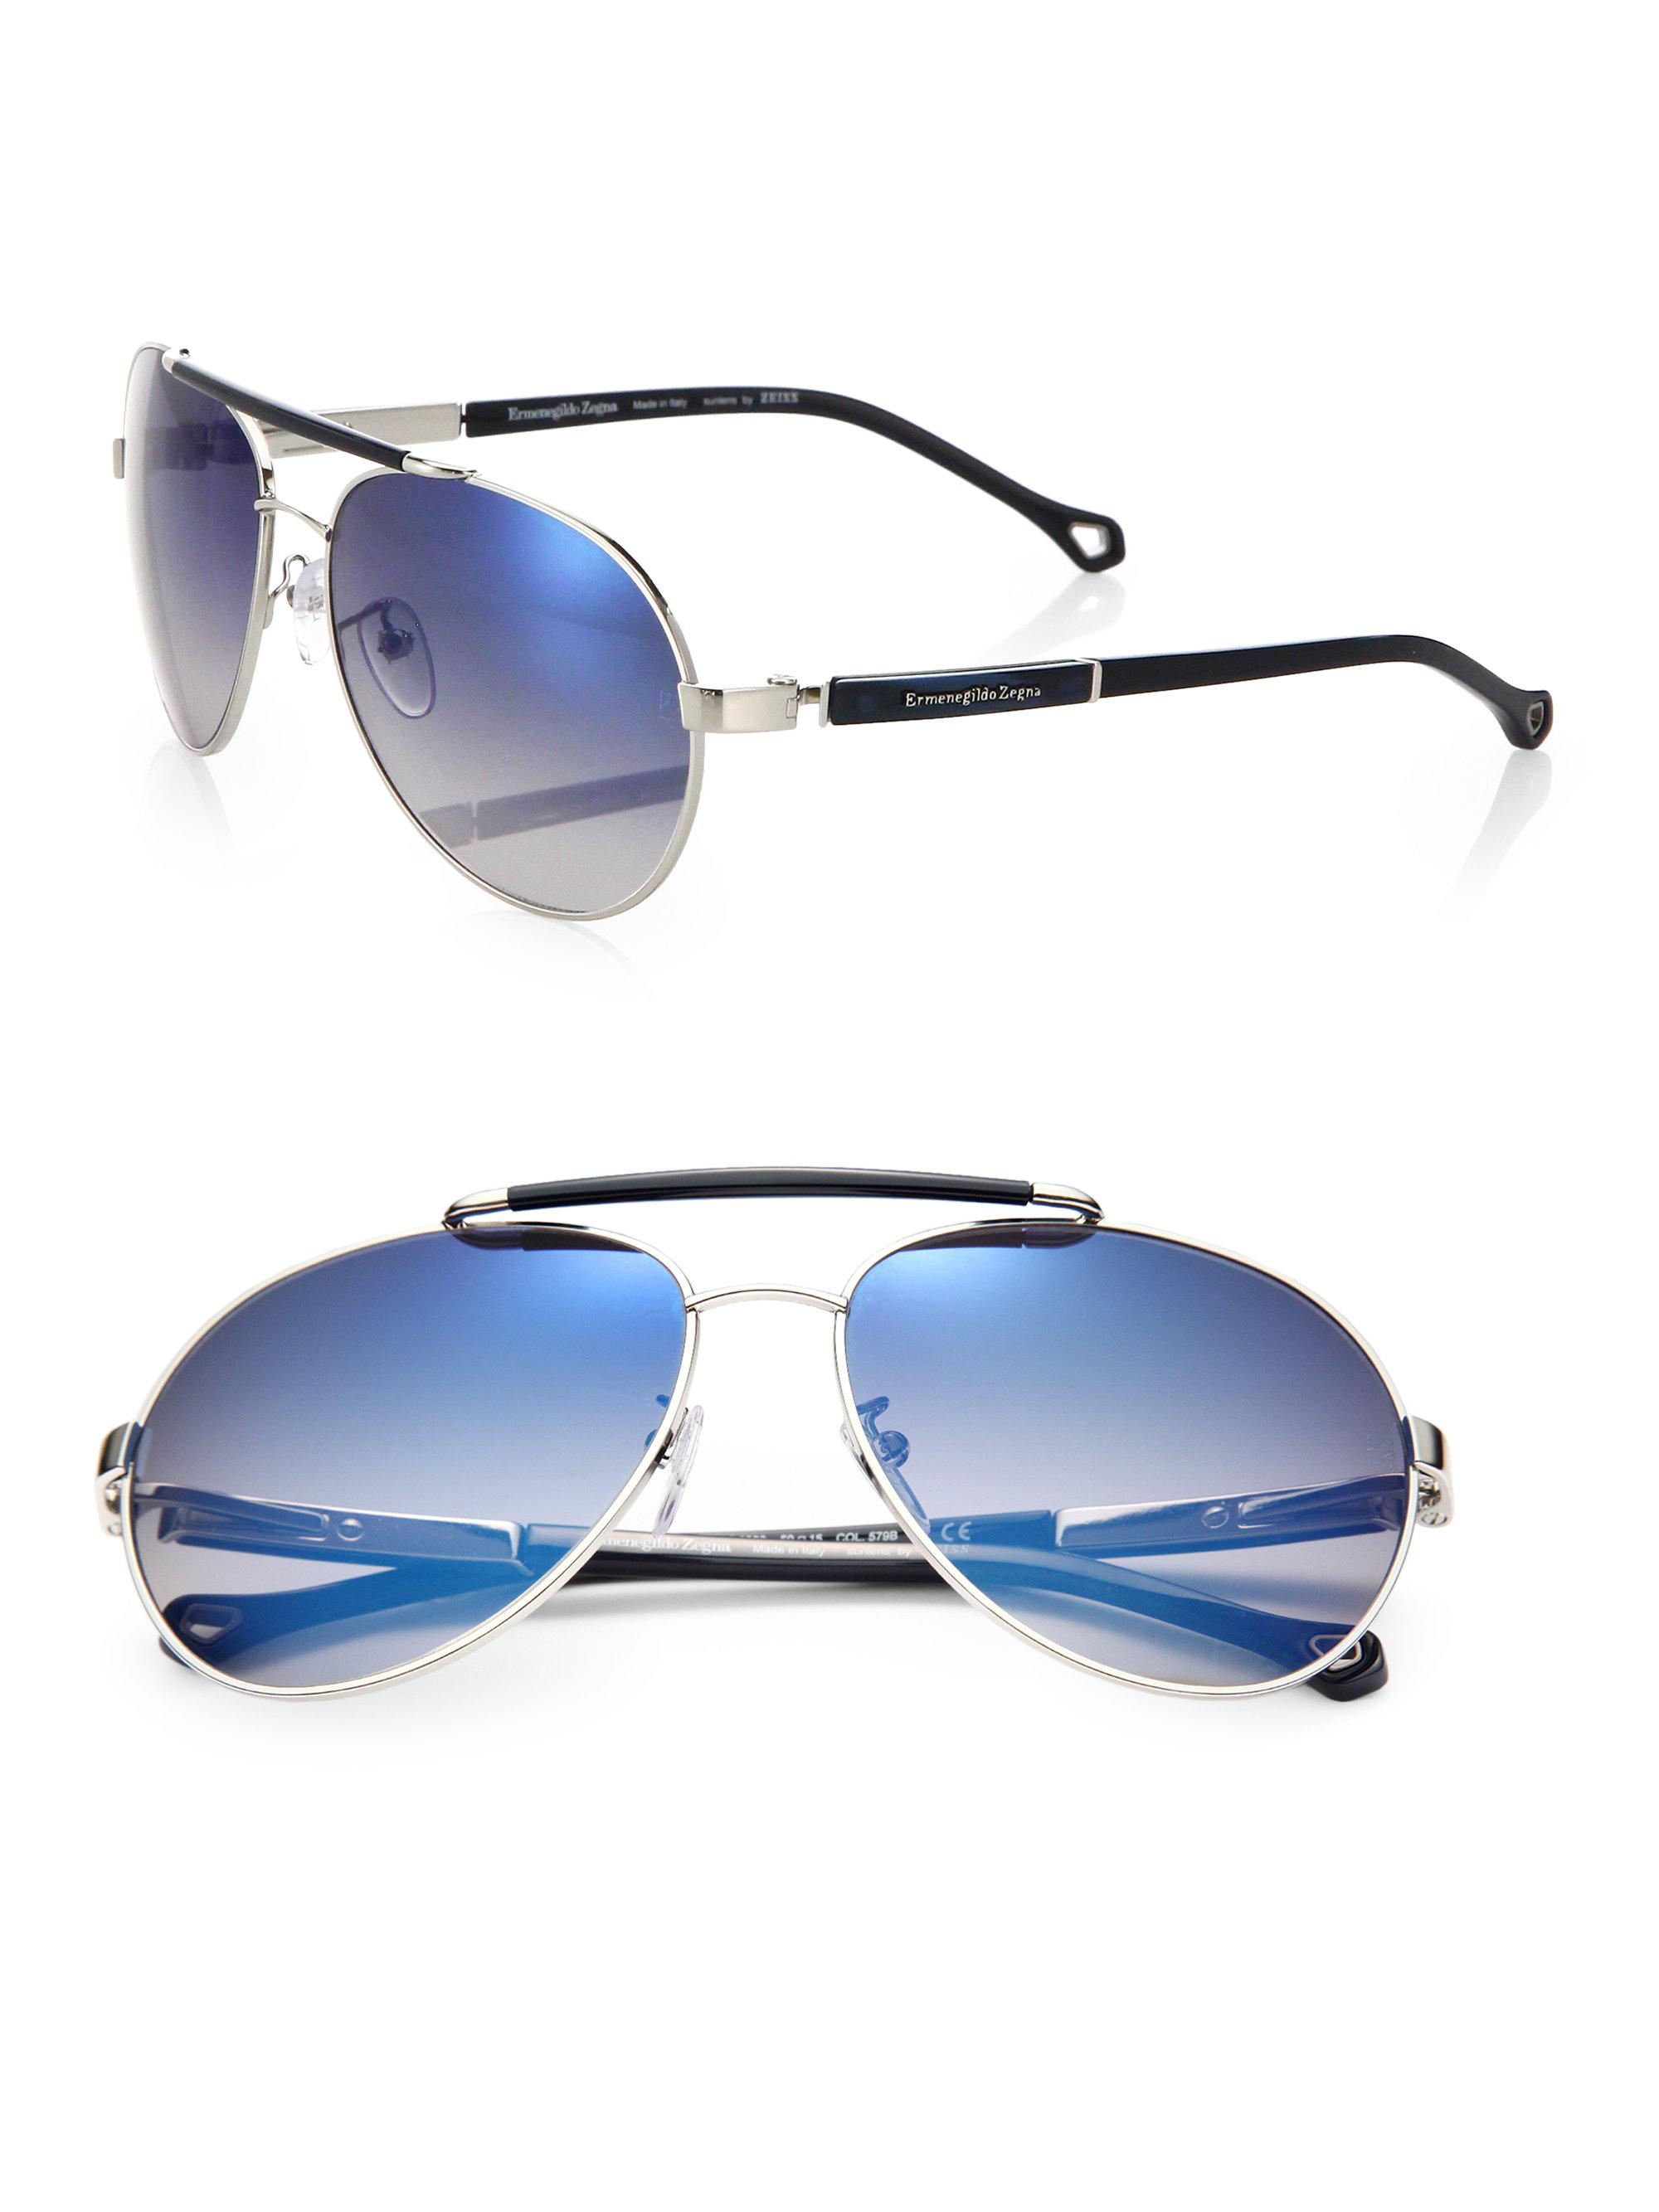 7c1854bc Ermenegildo Zegna Blue Metal & Resin Aviator Sunglasses for men